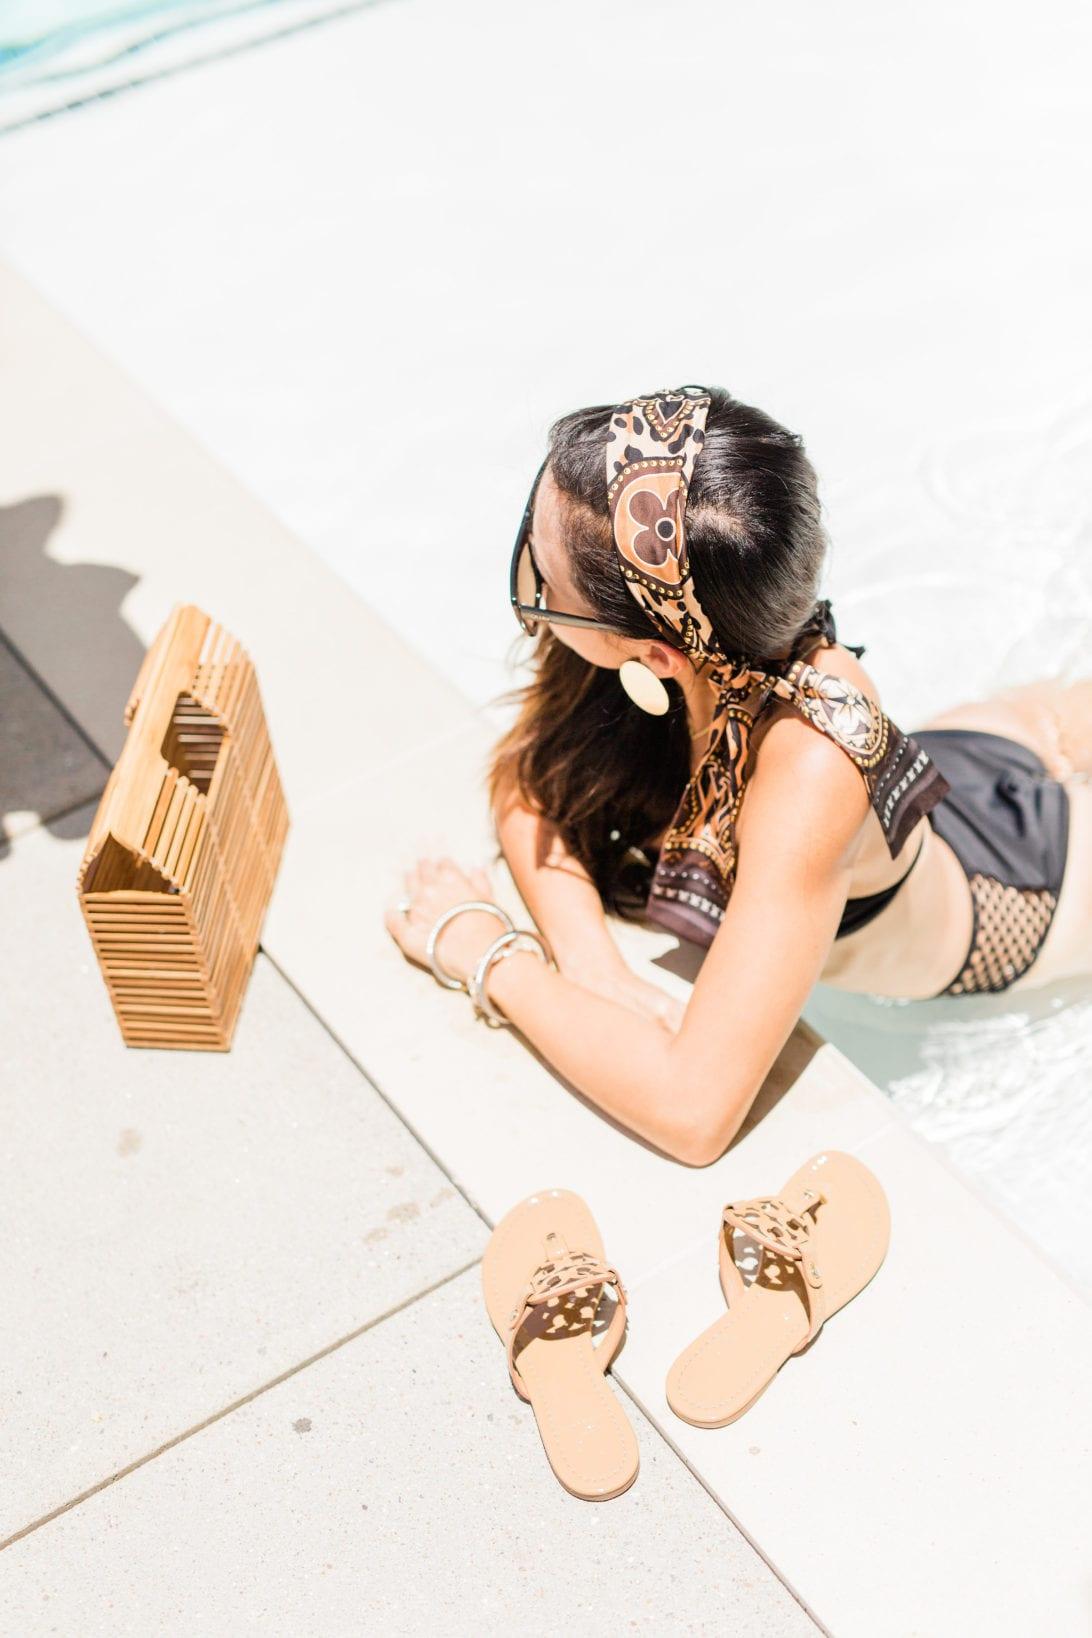 Louis Vuitton Monogrammed bag, Neverfull Gm, World Tour, #LVWORLD, #LOUISVUITTON, Louis Vuitton World Tour Bandeau, Bandeau, #summerstyle, #summerfashion, black bikini, date night look,